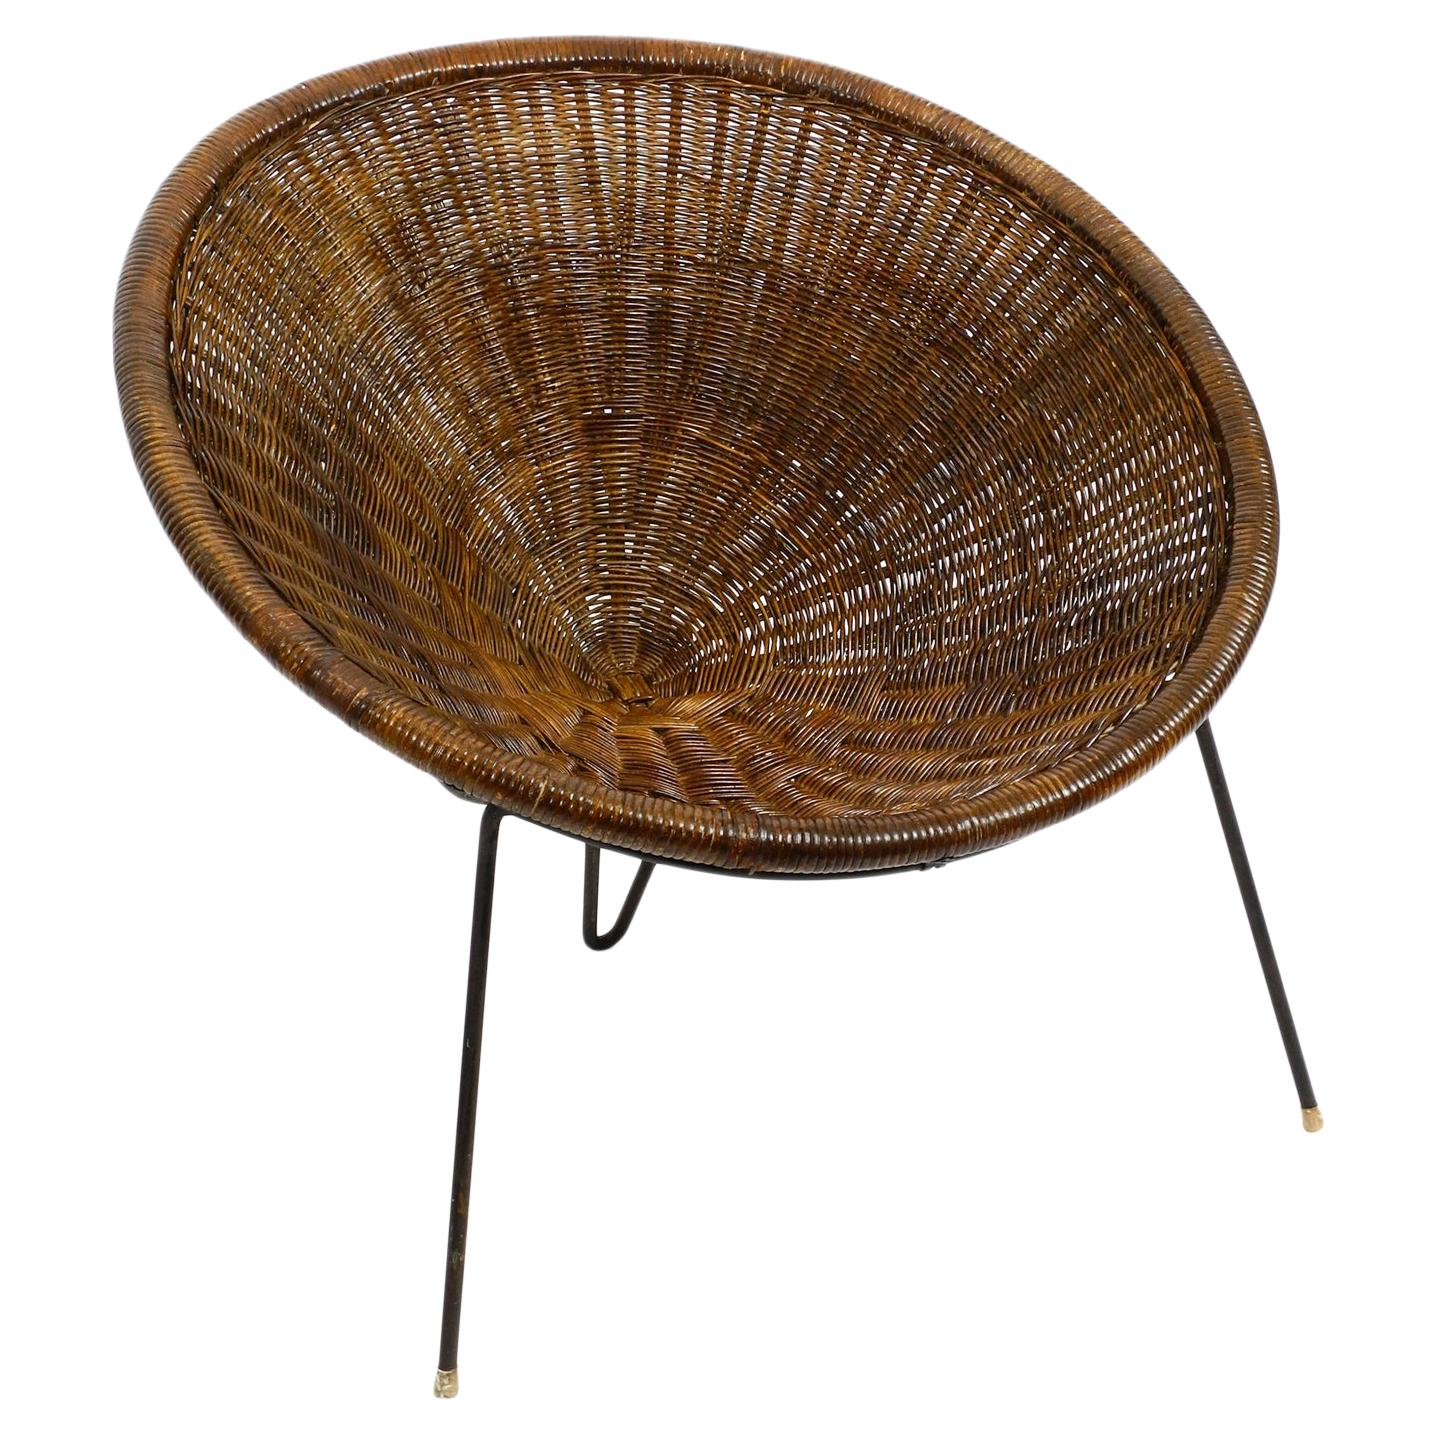 Italian Tripod Mid Century Lounge Basket Chair Made of Wicker by Roberto Mango